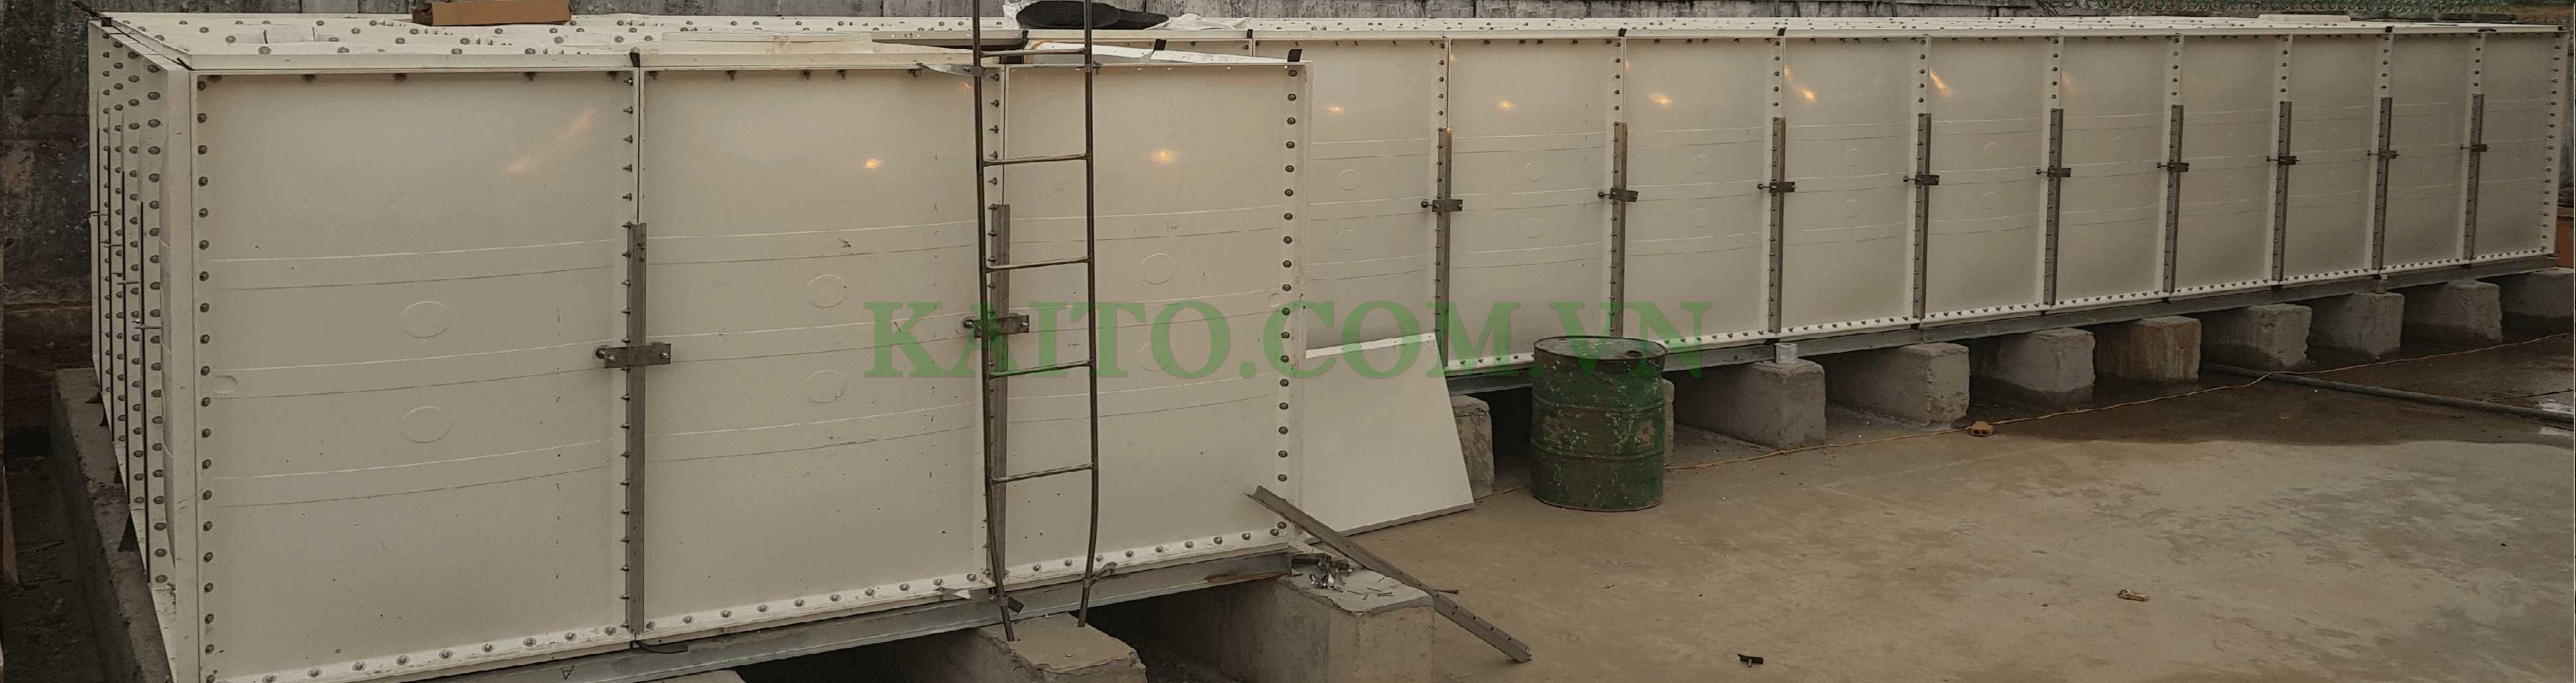 bồn composite lắp ghép chứa nước